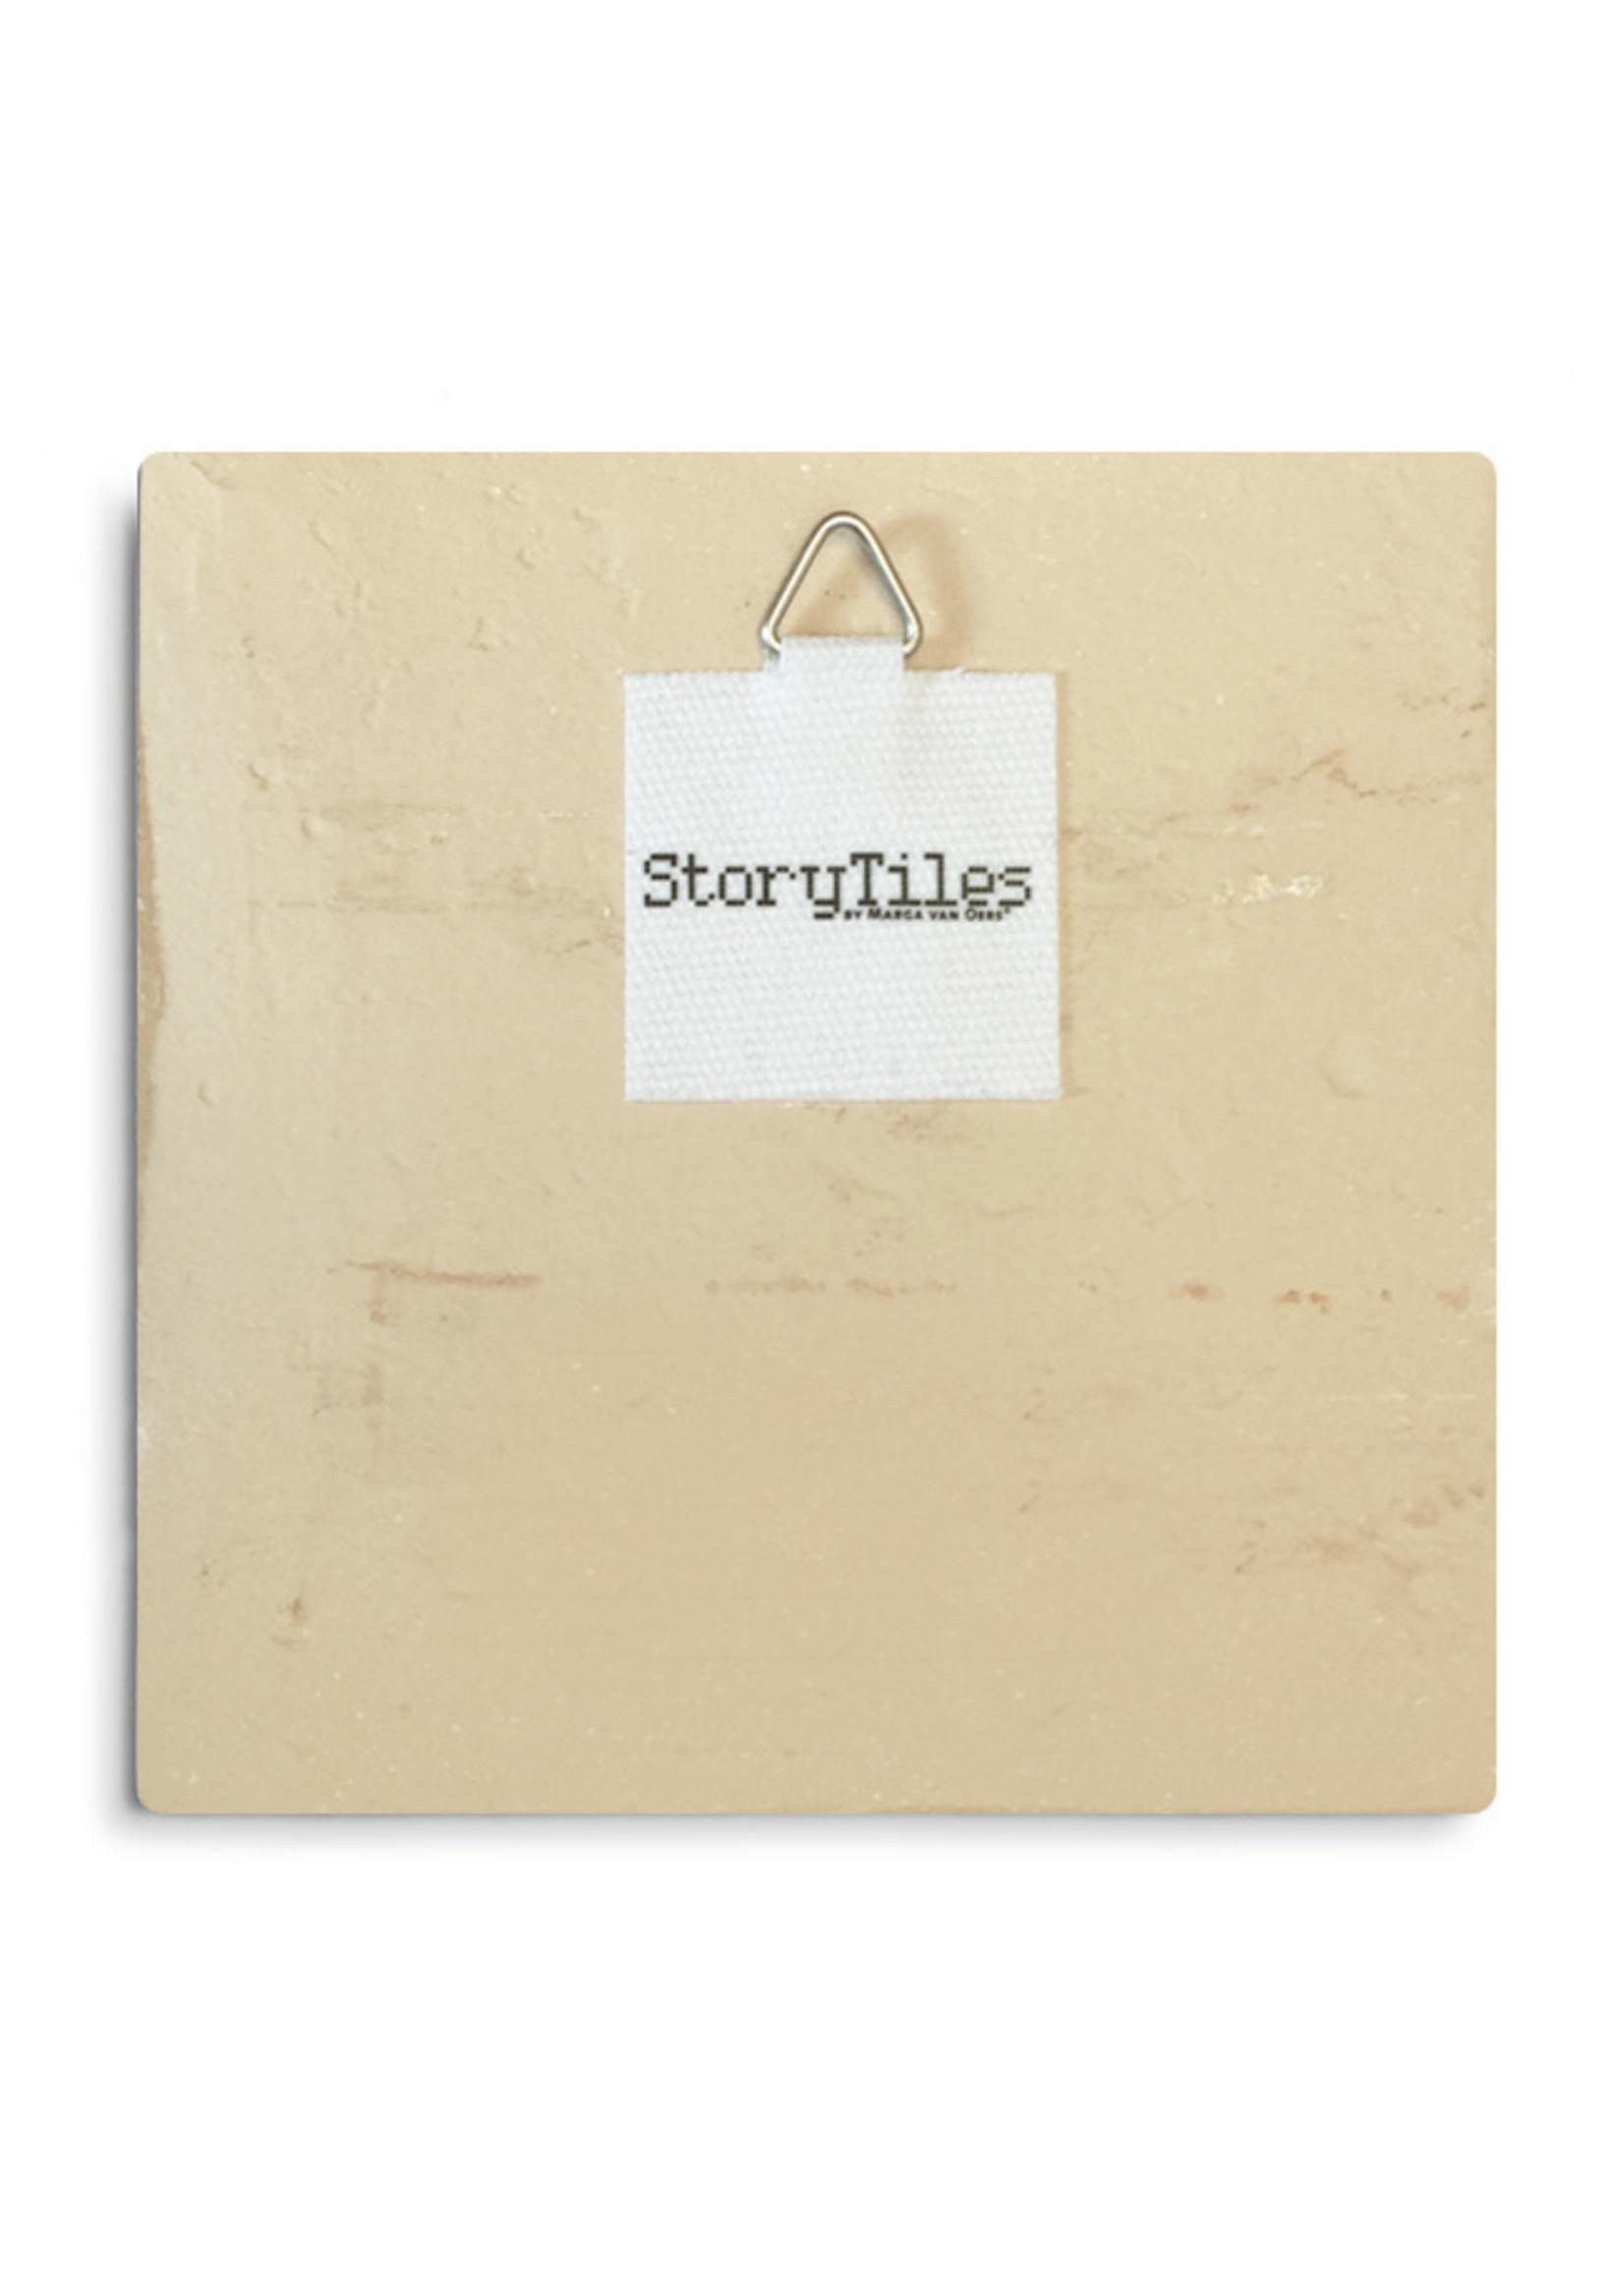 Storytiles Aloha 13x13cm